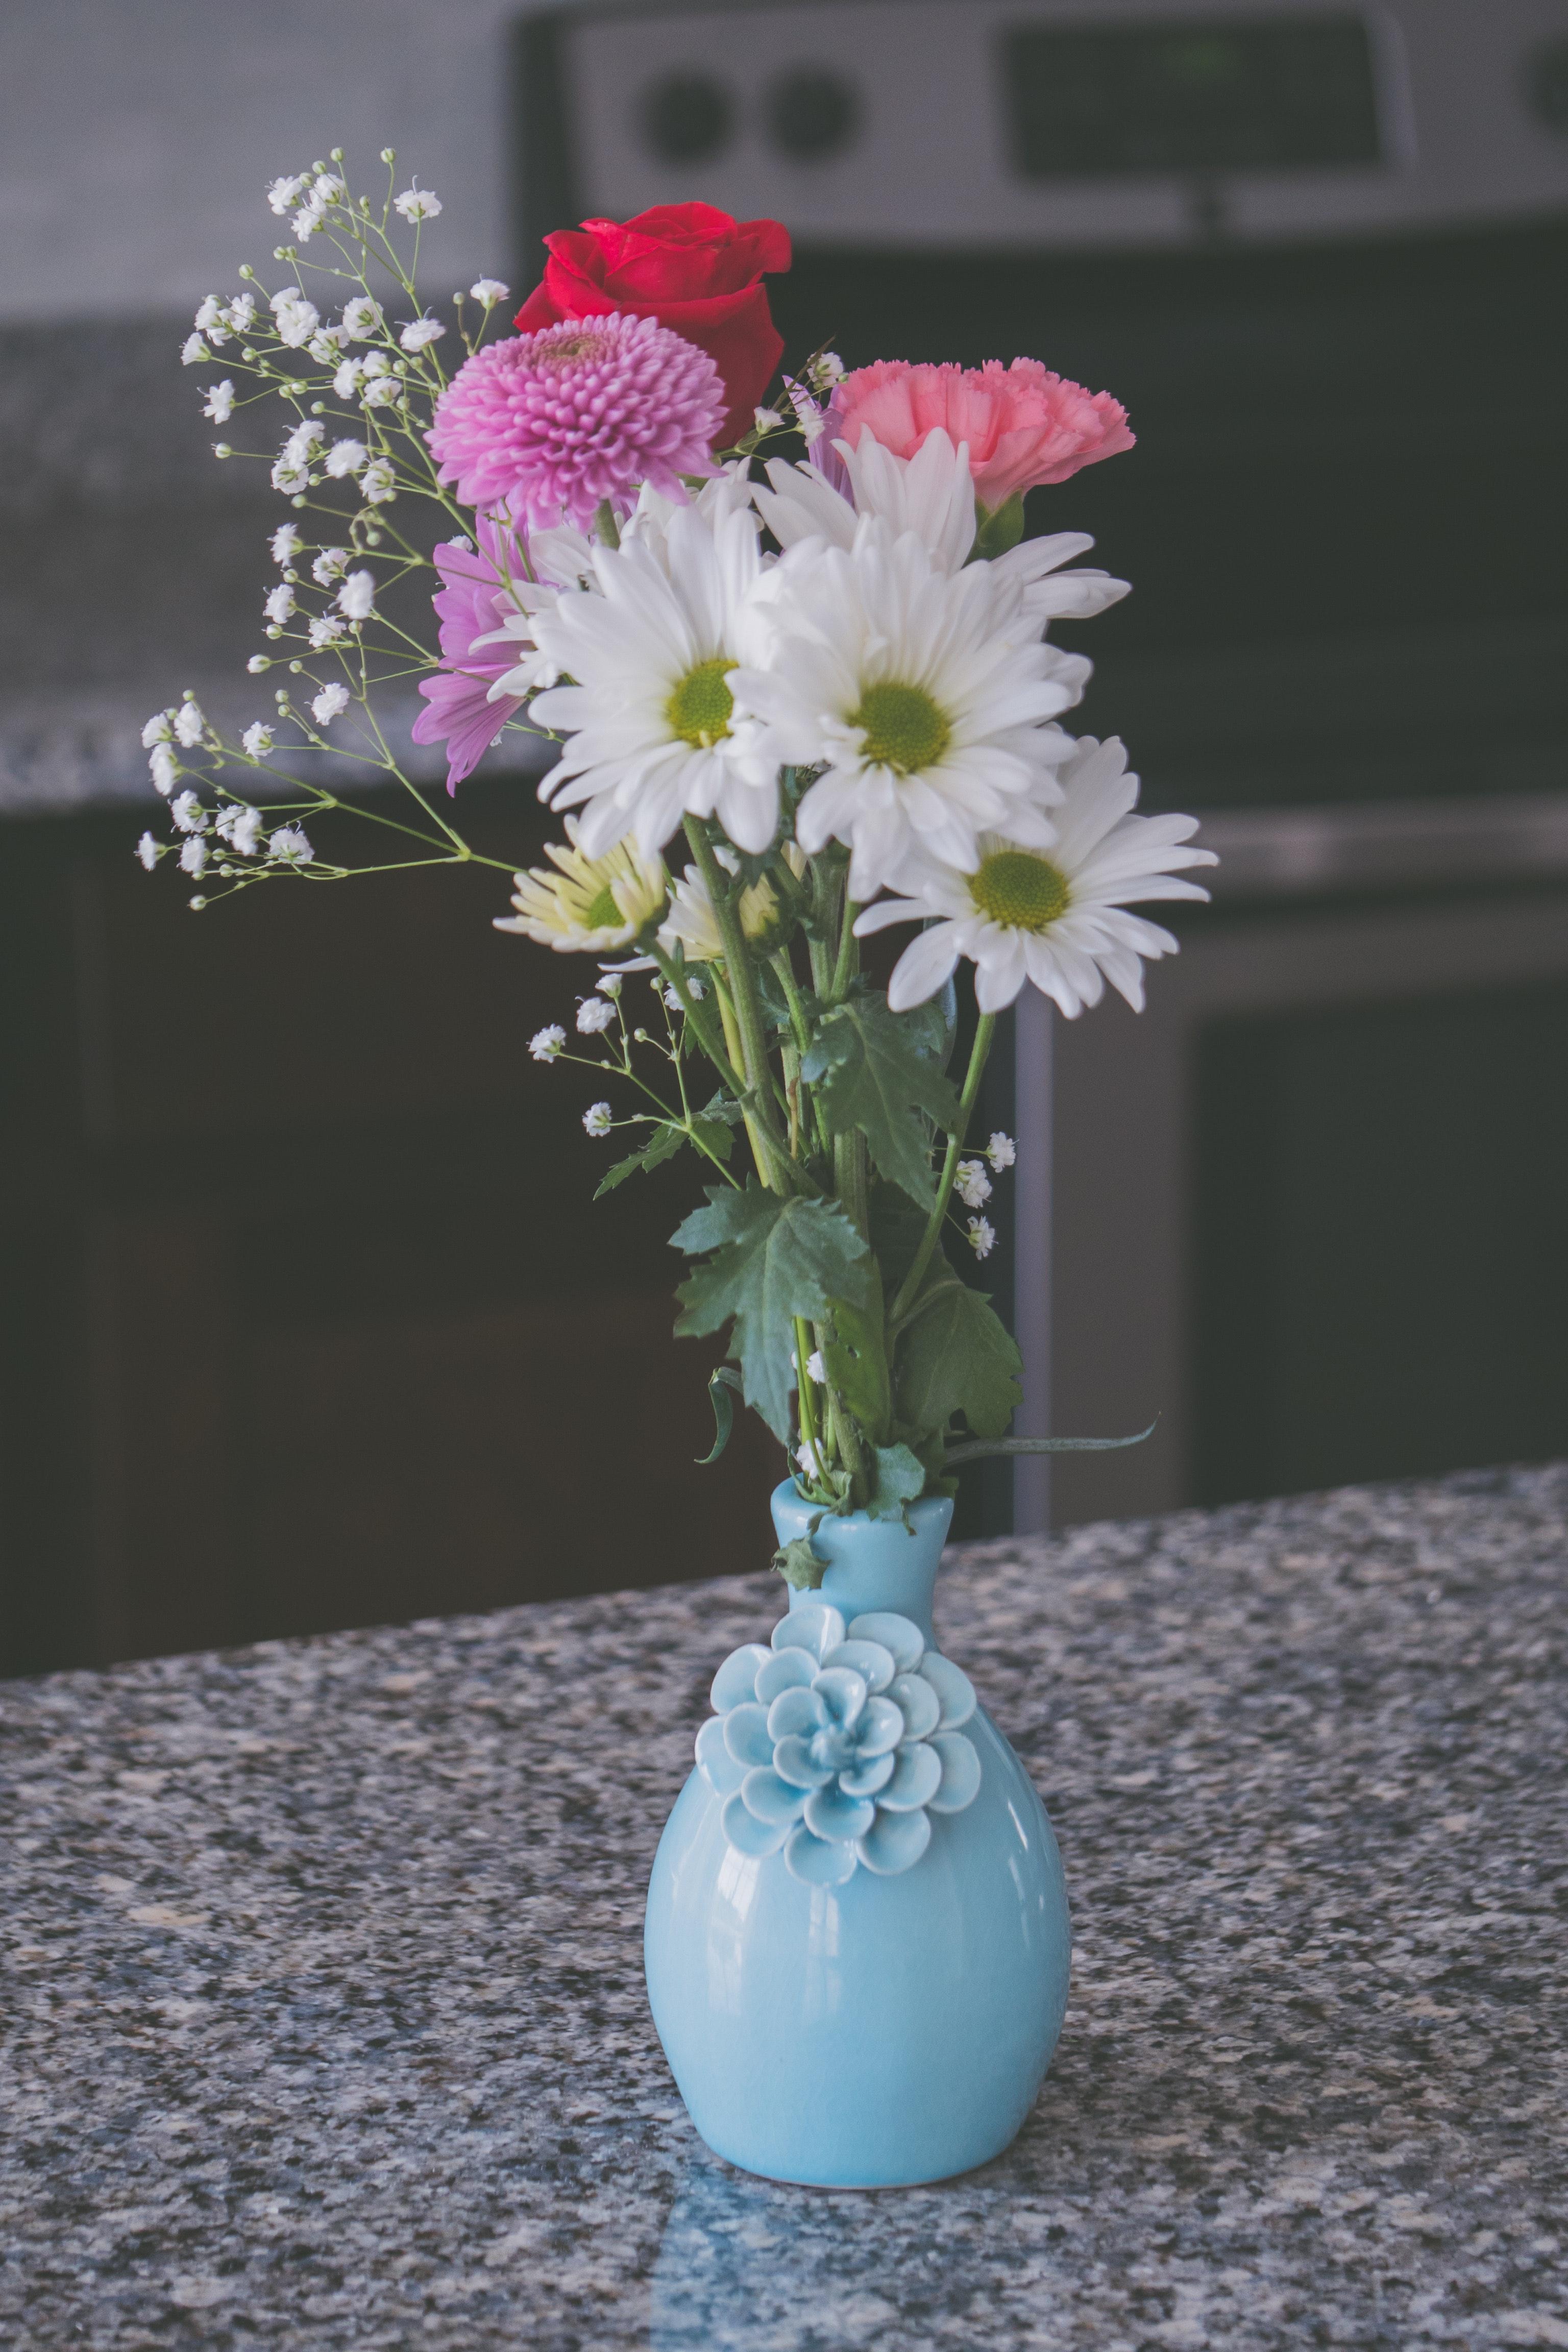 Assorted Flowers in Blue Vase & 1000+ Interesting Flower Vase Photos · Pexels · Free Stock Photos